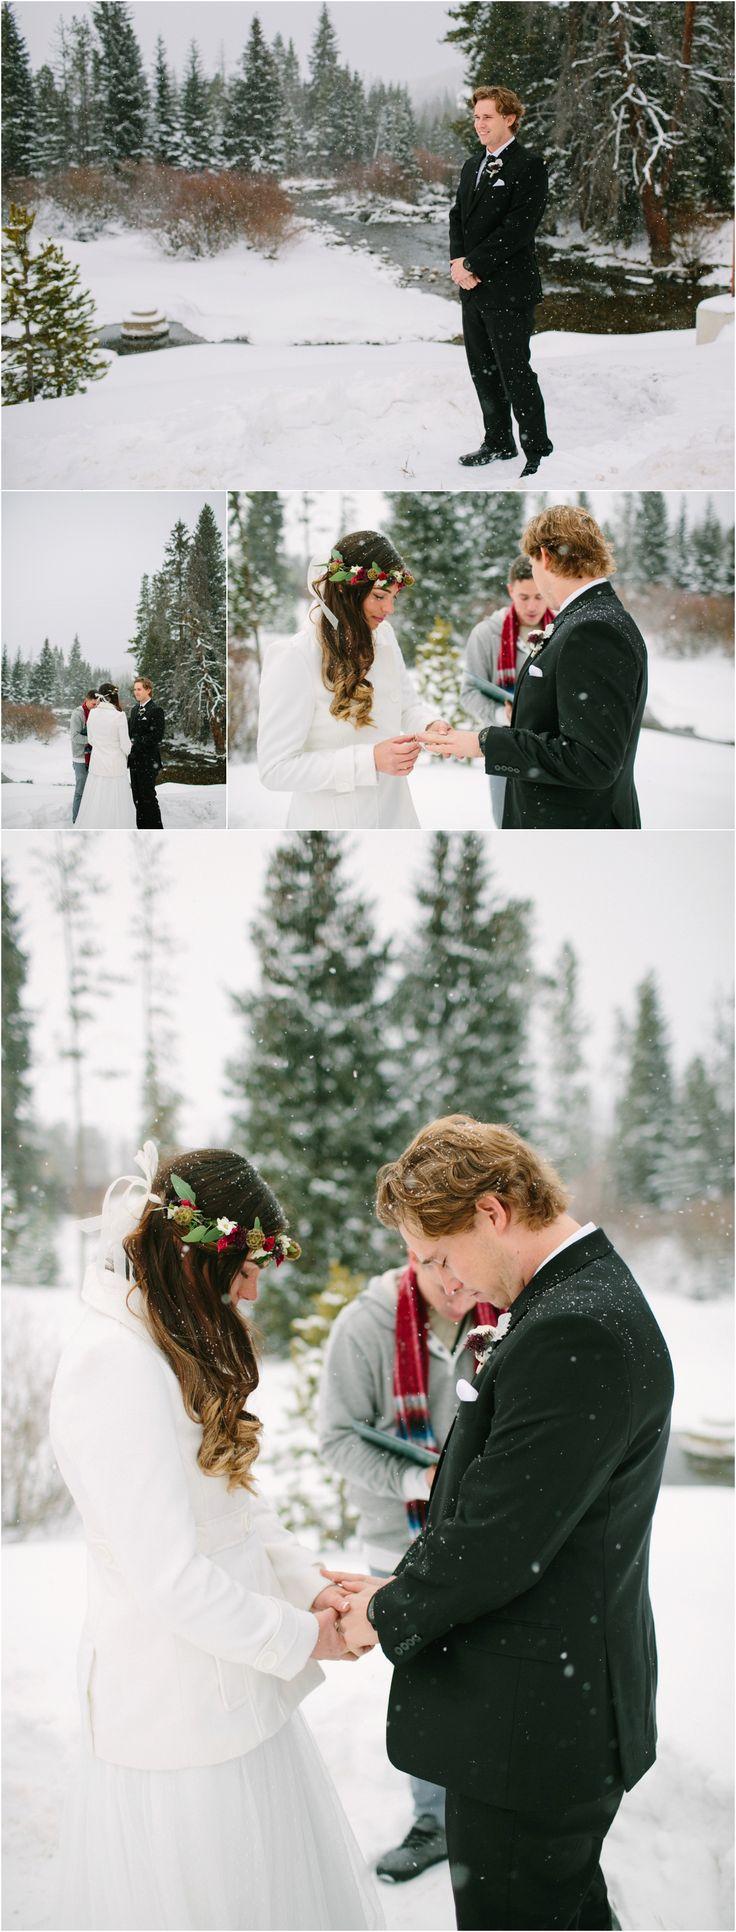 Winter wedding elopement in beautiful Breckenridge Colorado